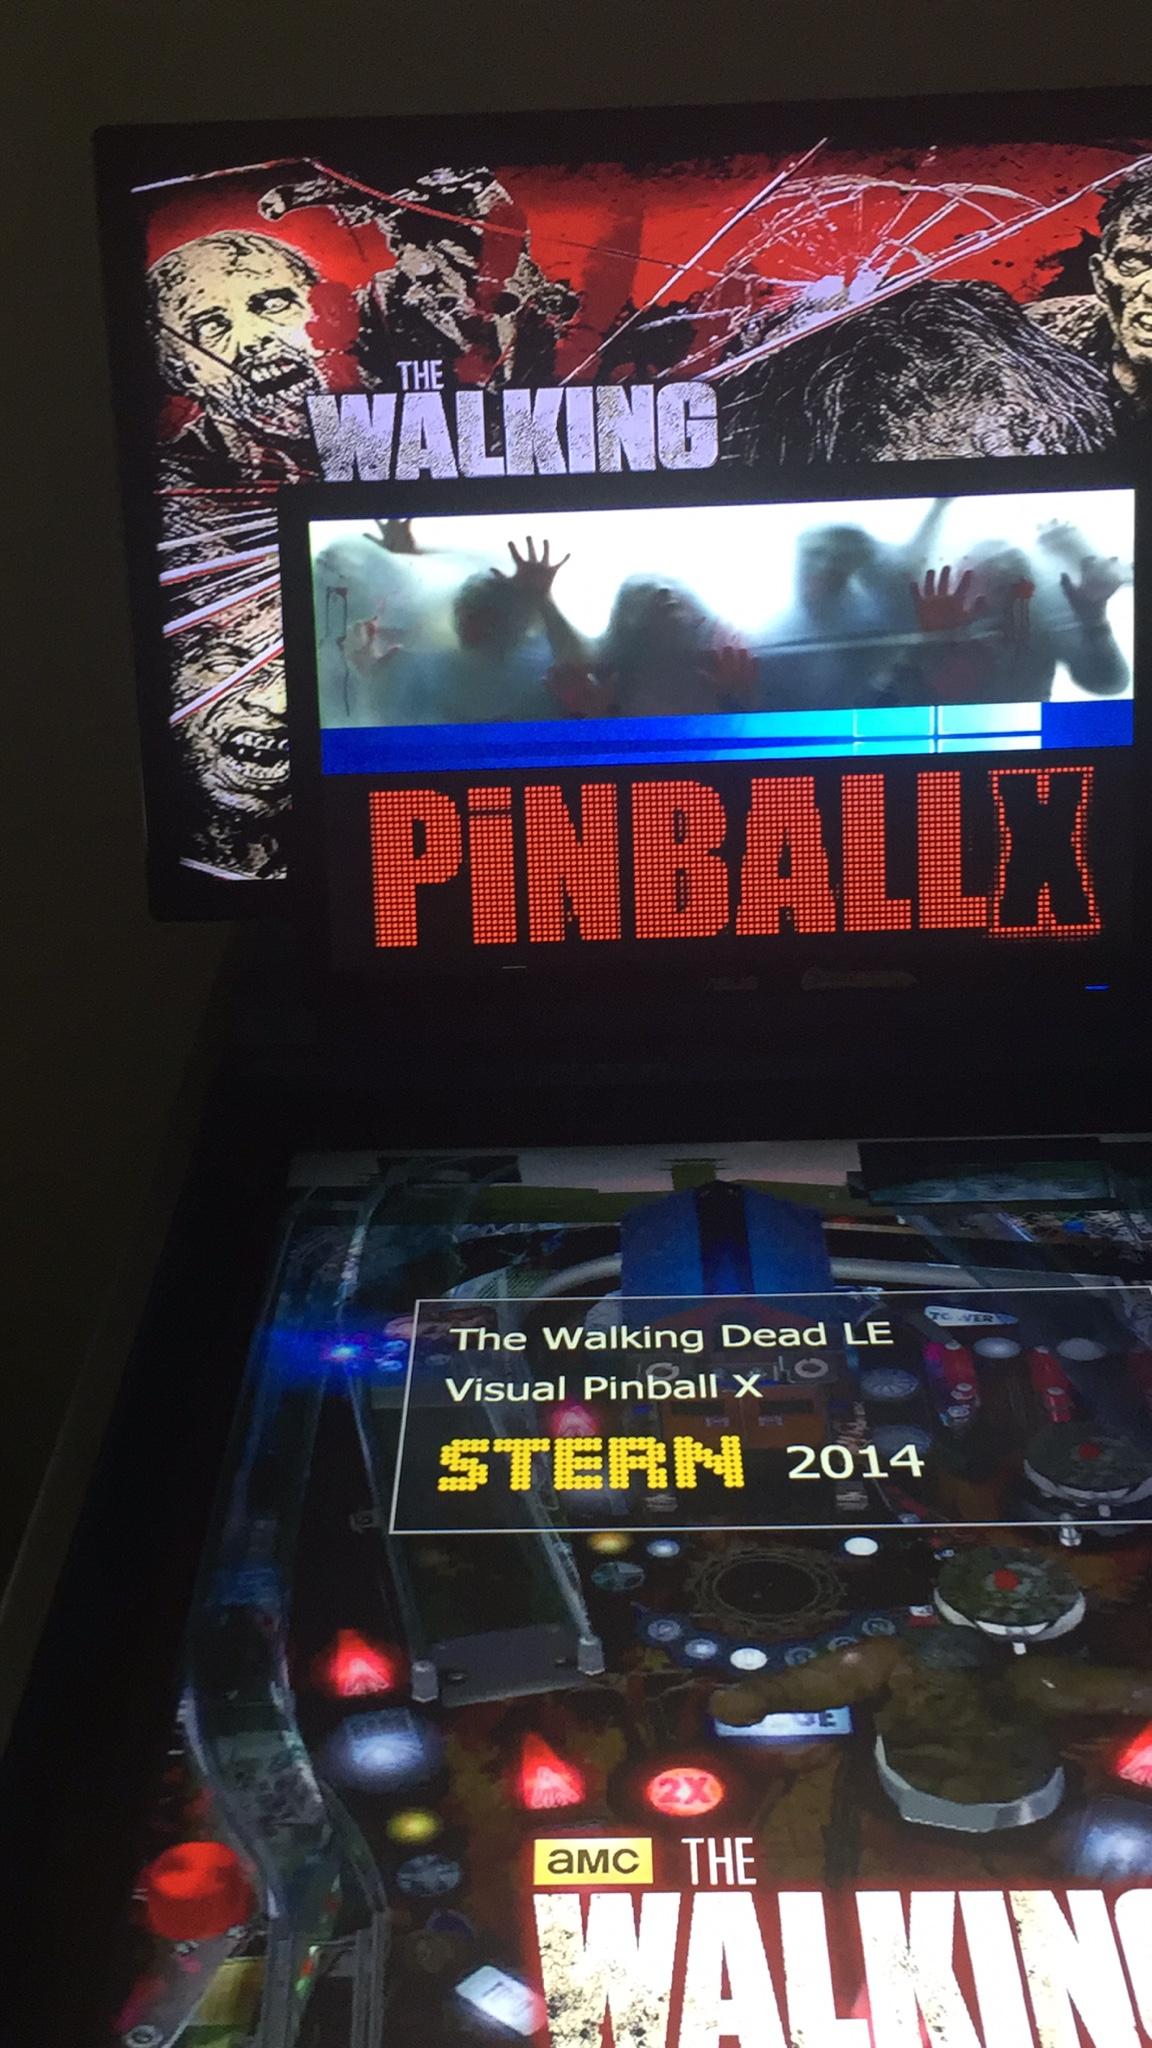 Making a Pinball Emulating PC